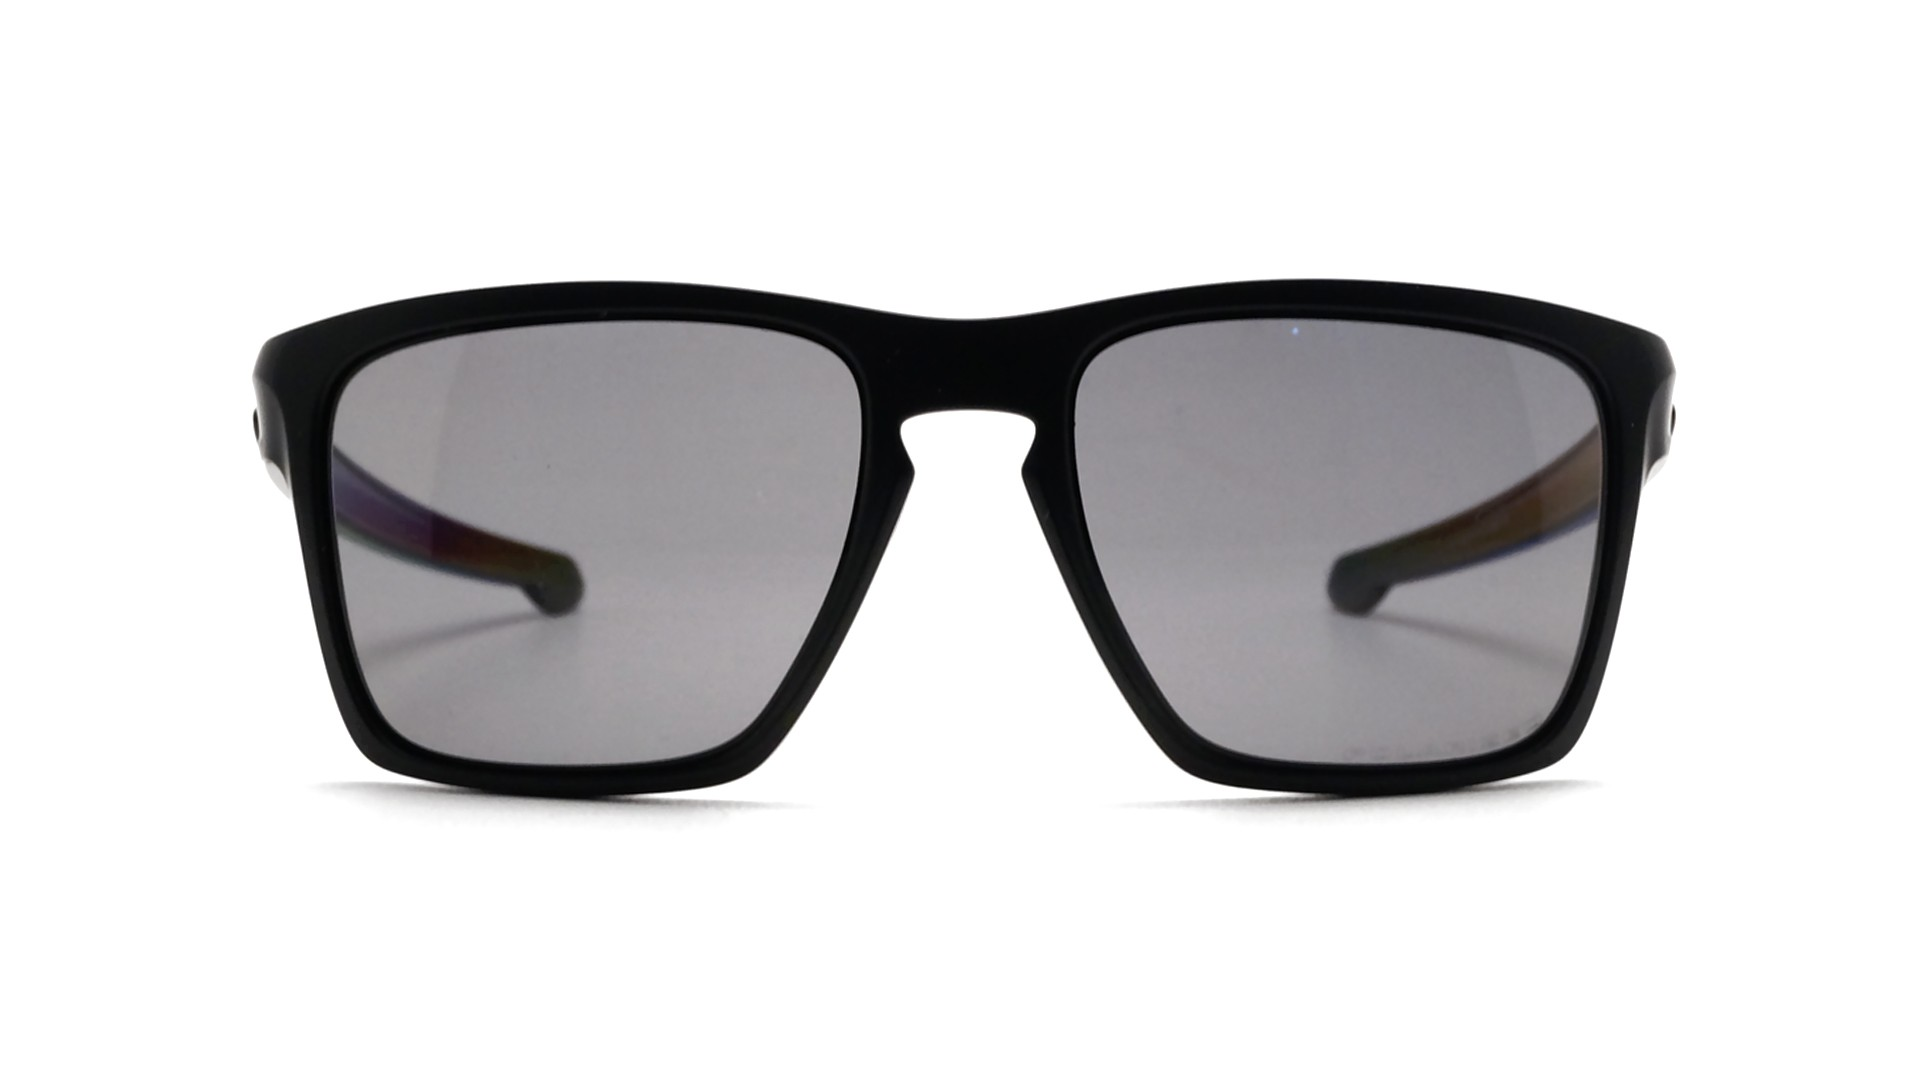 Sunglasses Oakley Sliver Xl Black OO9341 01 57-18 Large Polarized 6ab7e169fb